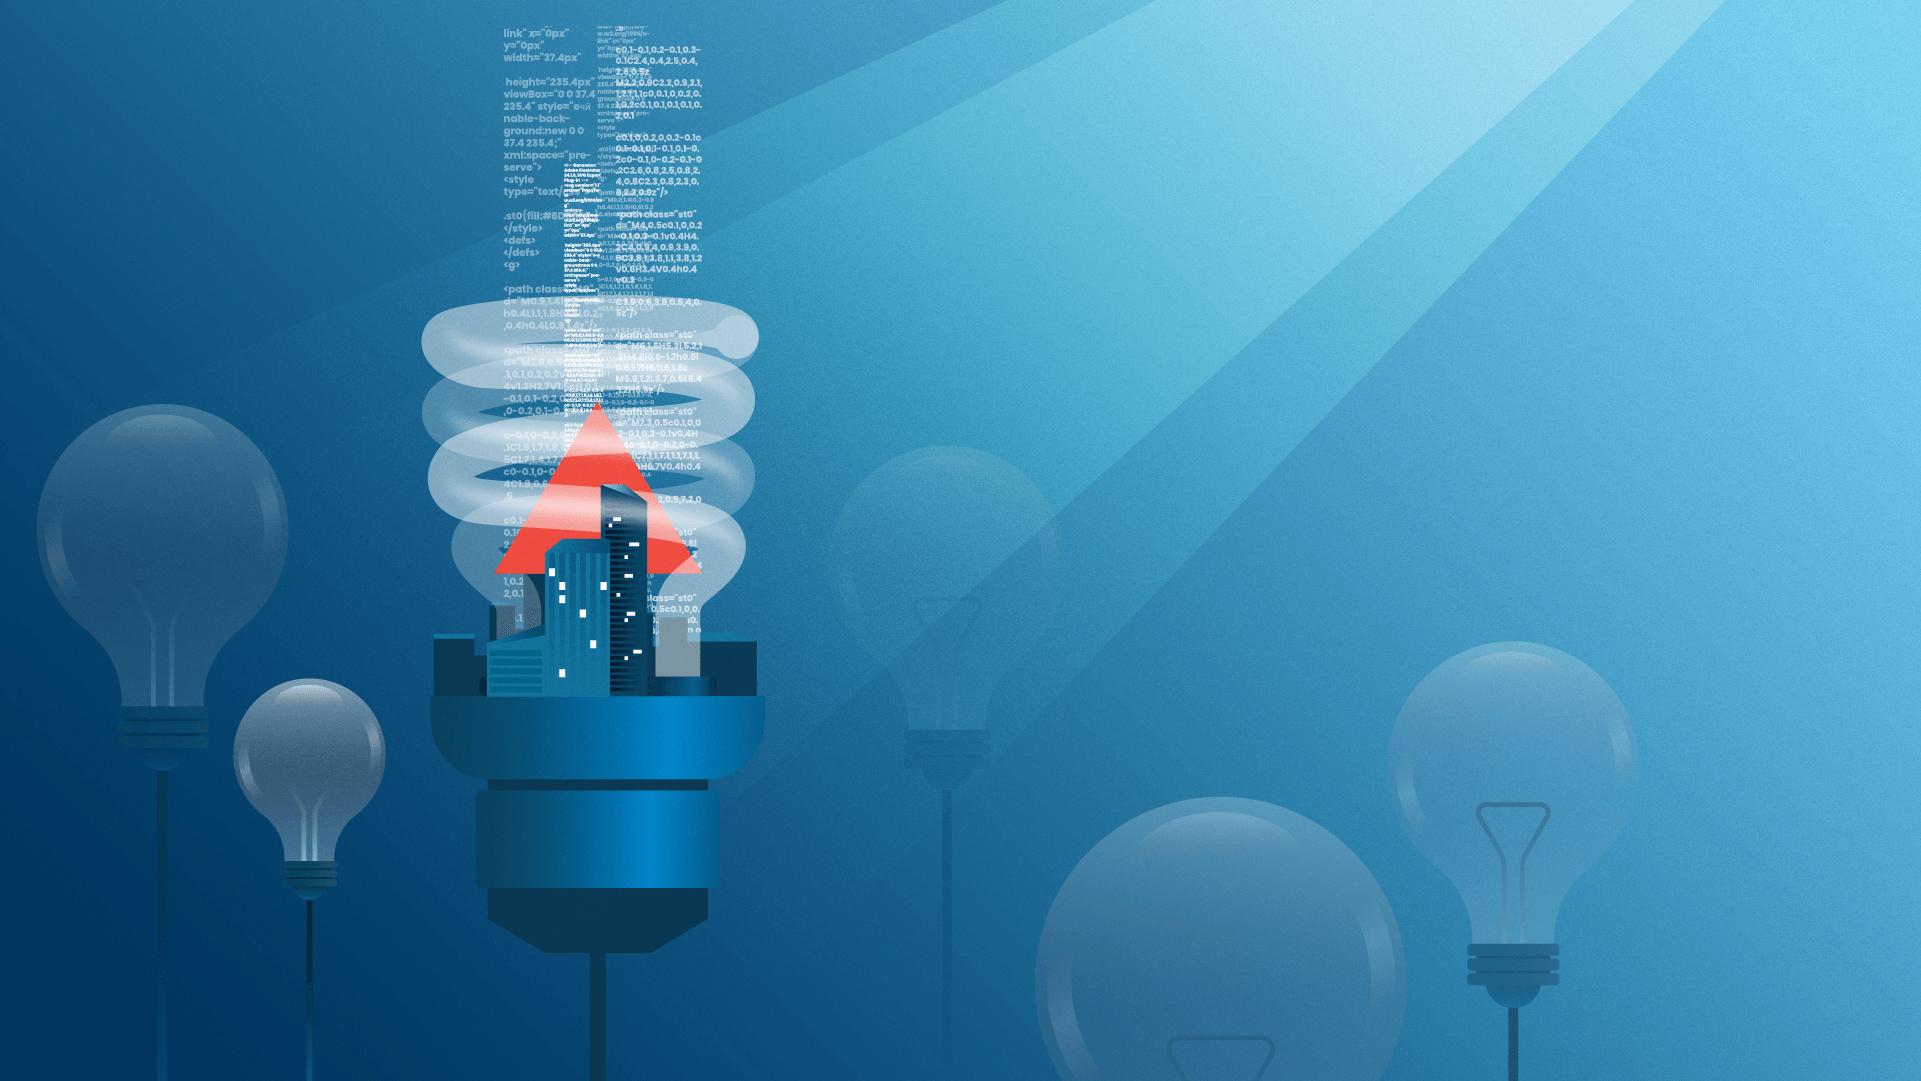 Light-Bulb-City-1920x1080-1 -- Compressed